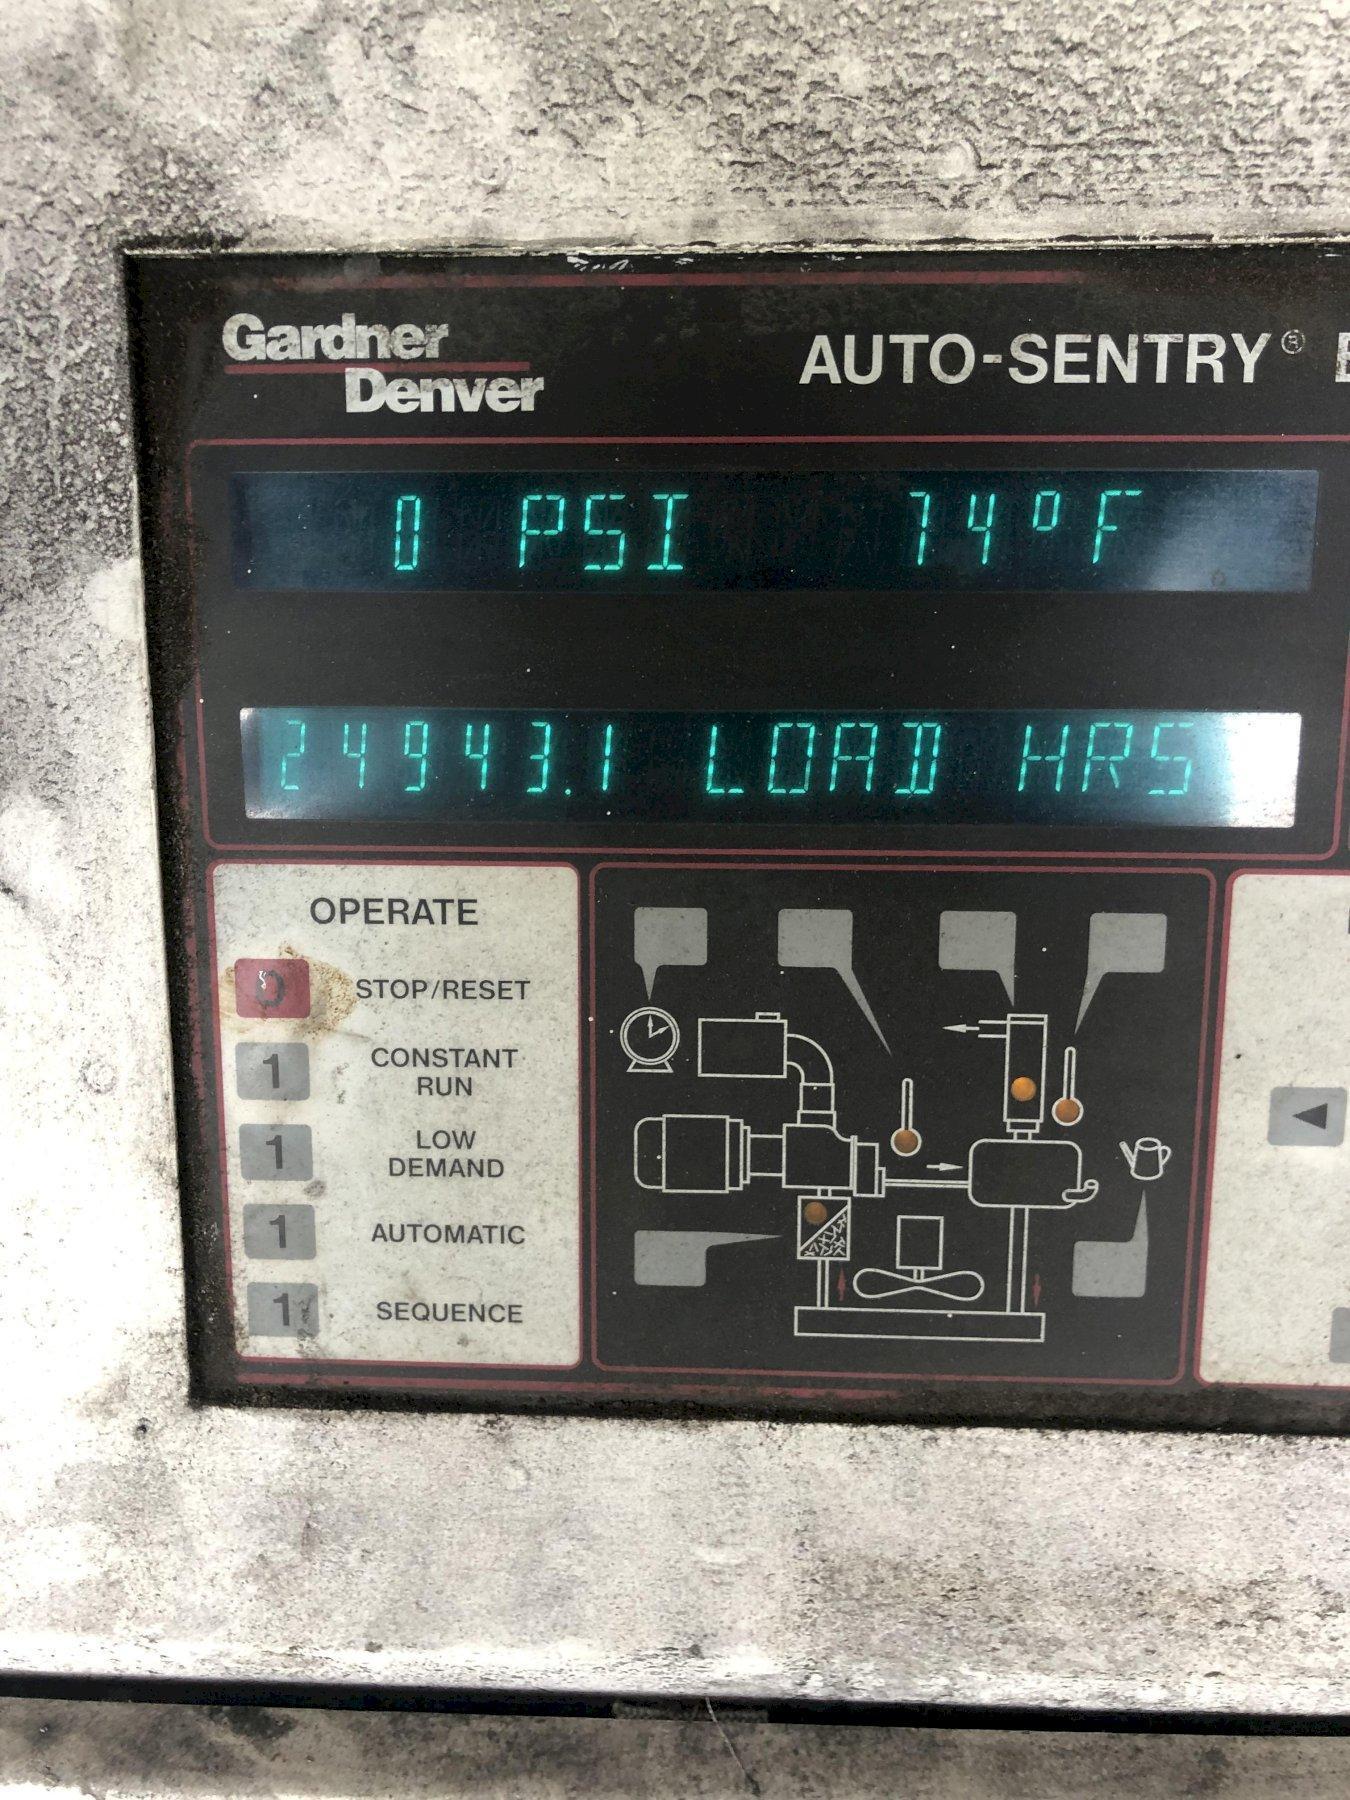 2001 GARDNER DENVER MODEL EBH99D209 ELECTRASAVER II 150HP AIR COOLED AIR COMPRESSOR S/N S104457